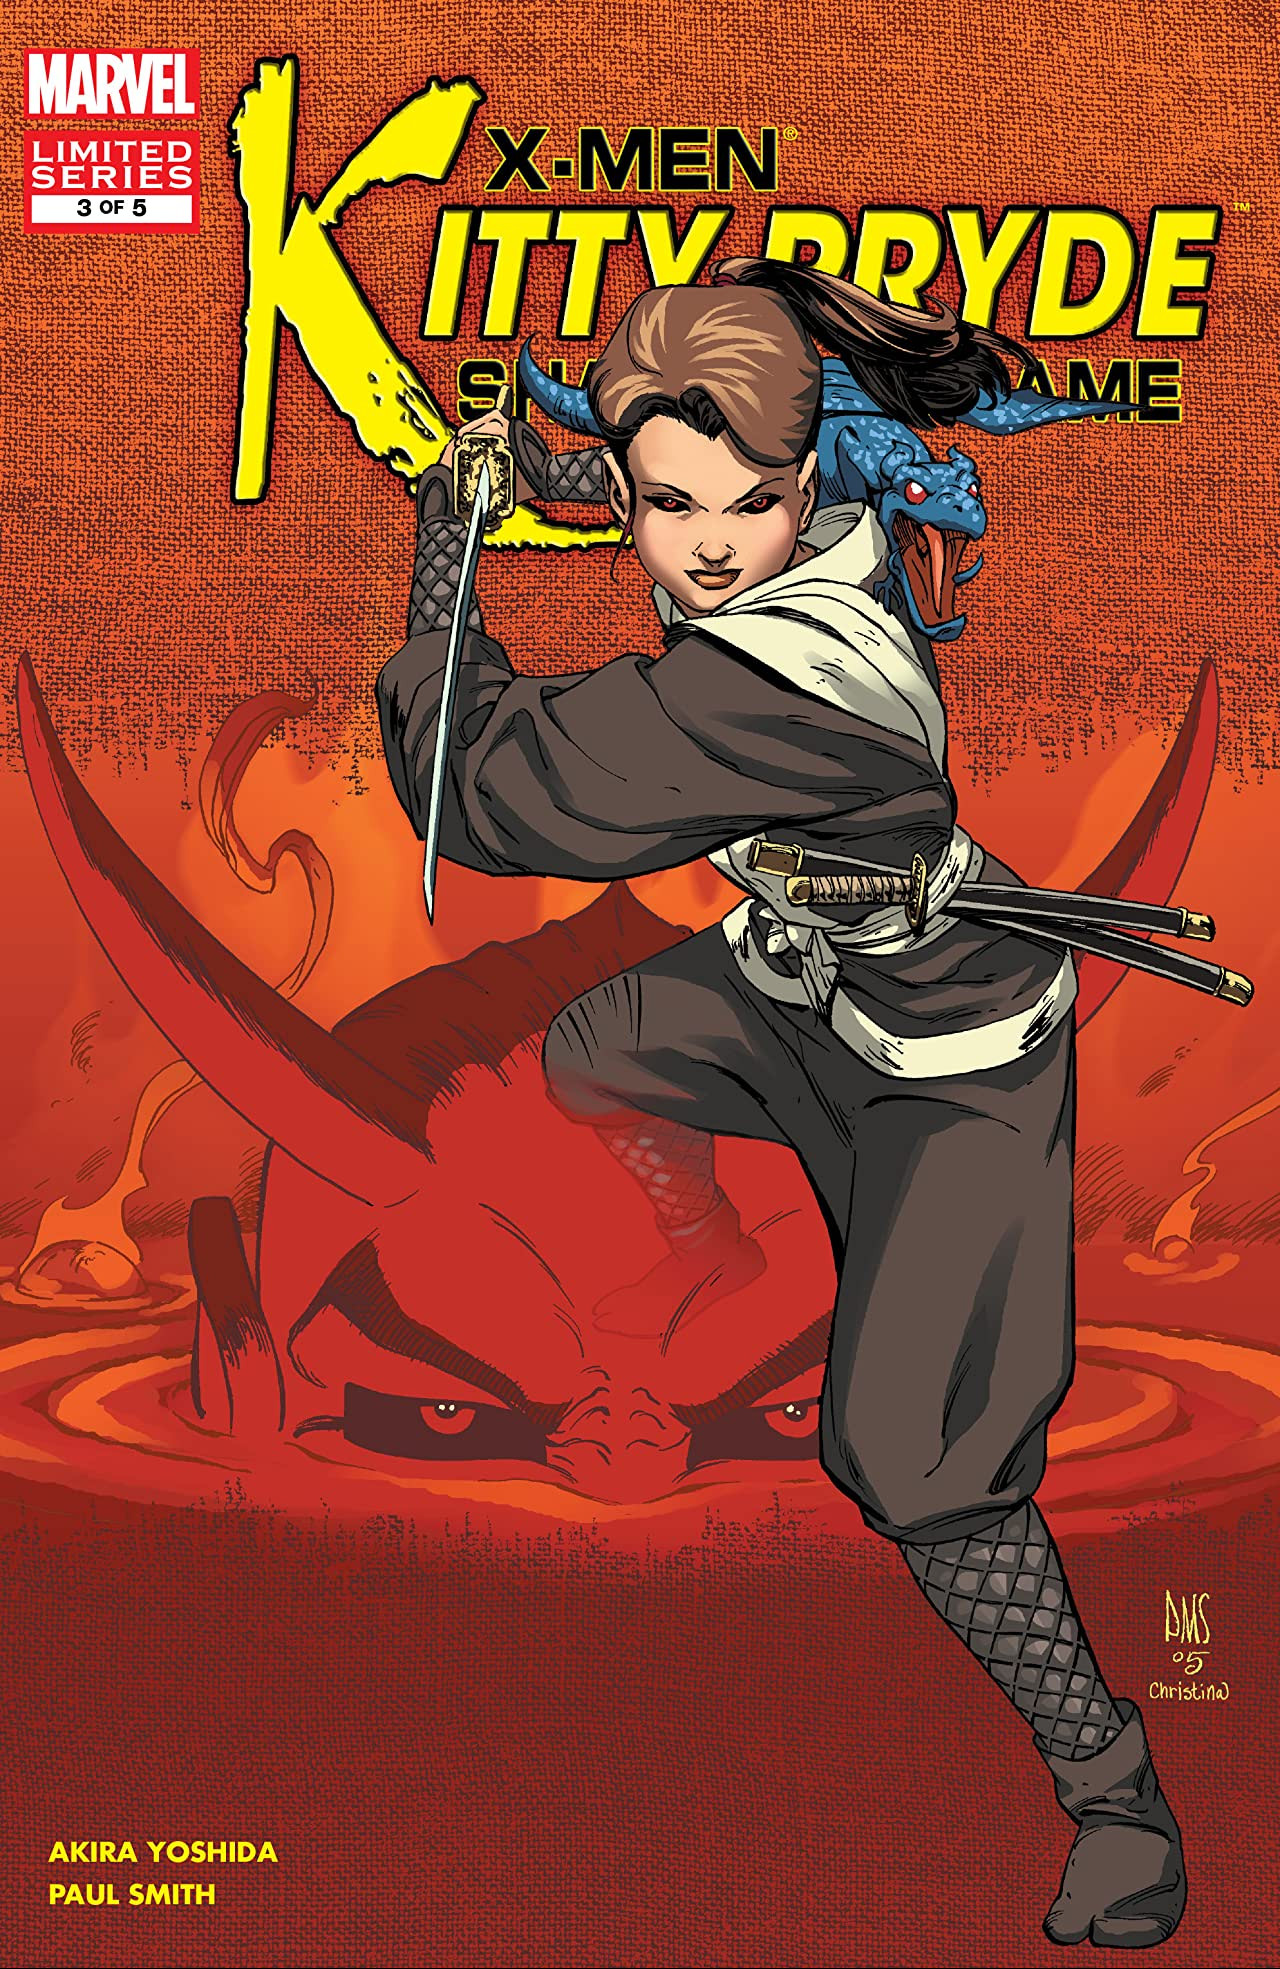 X-Men: Kitty Pryde - Shadow & Flame Vol 1 3